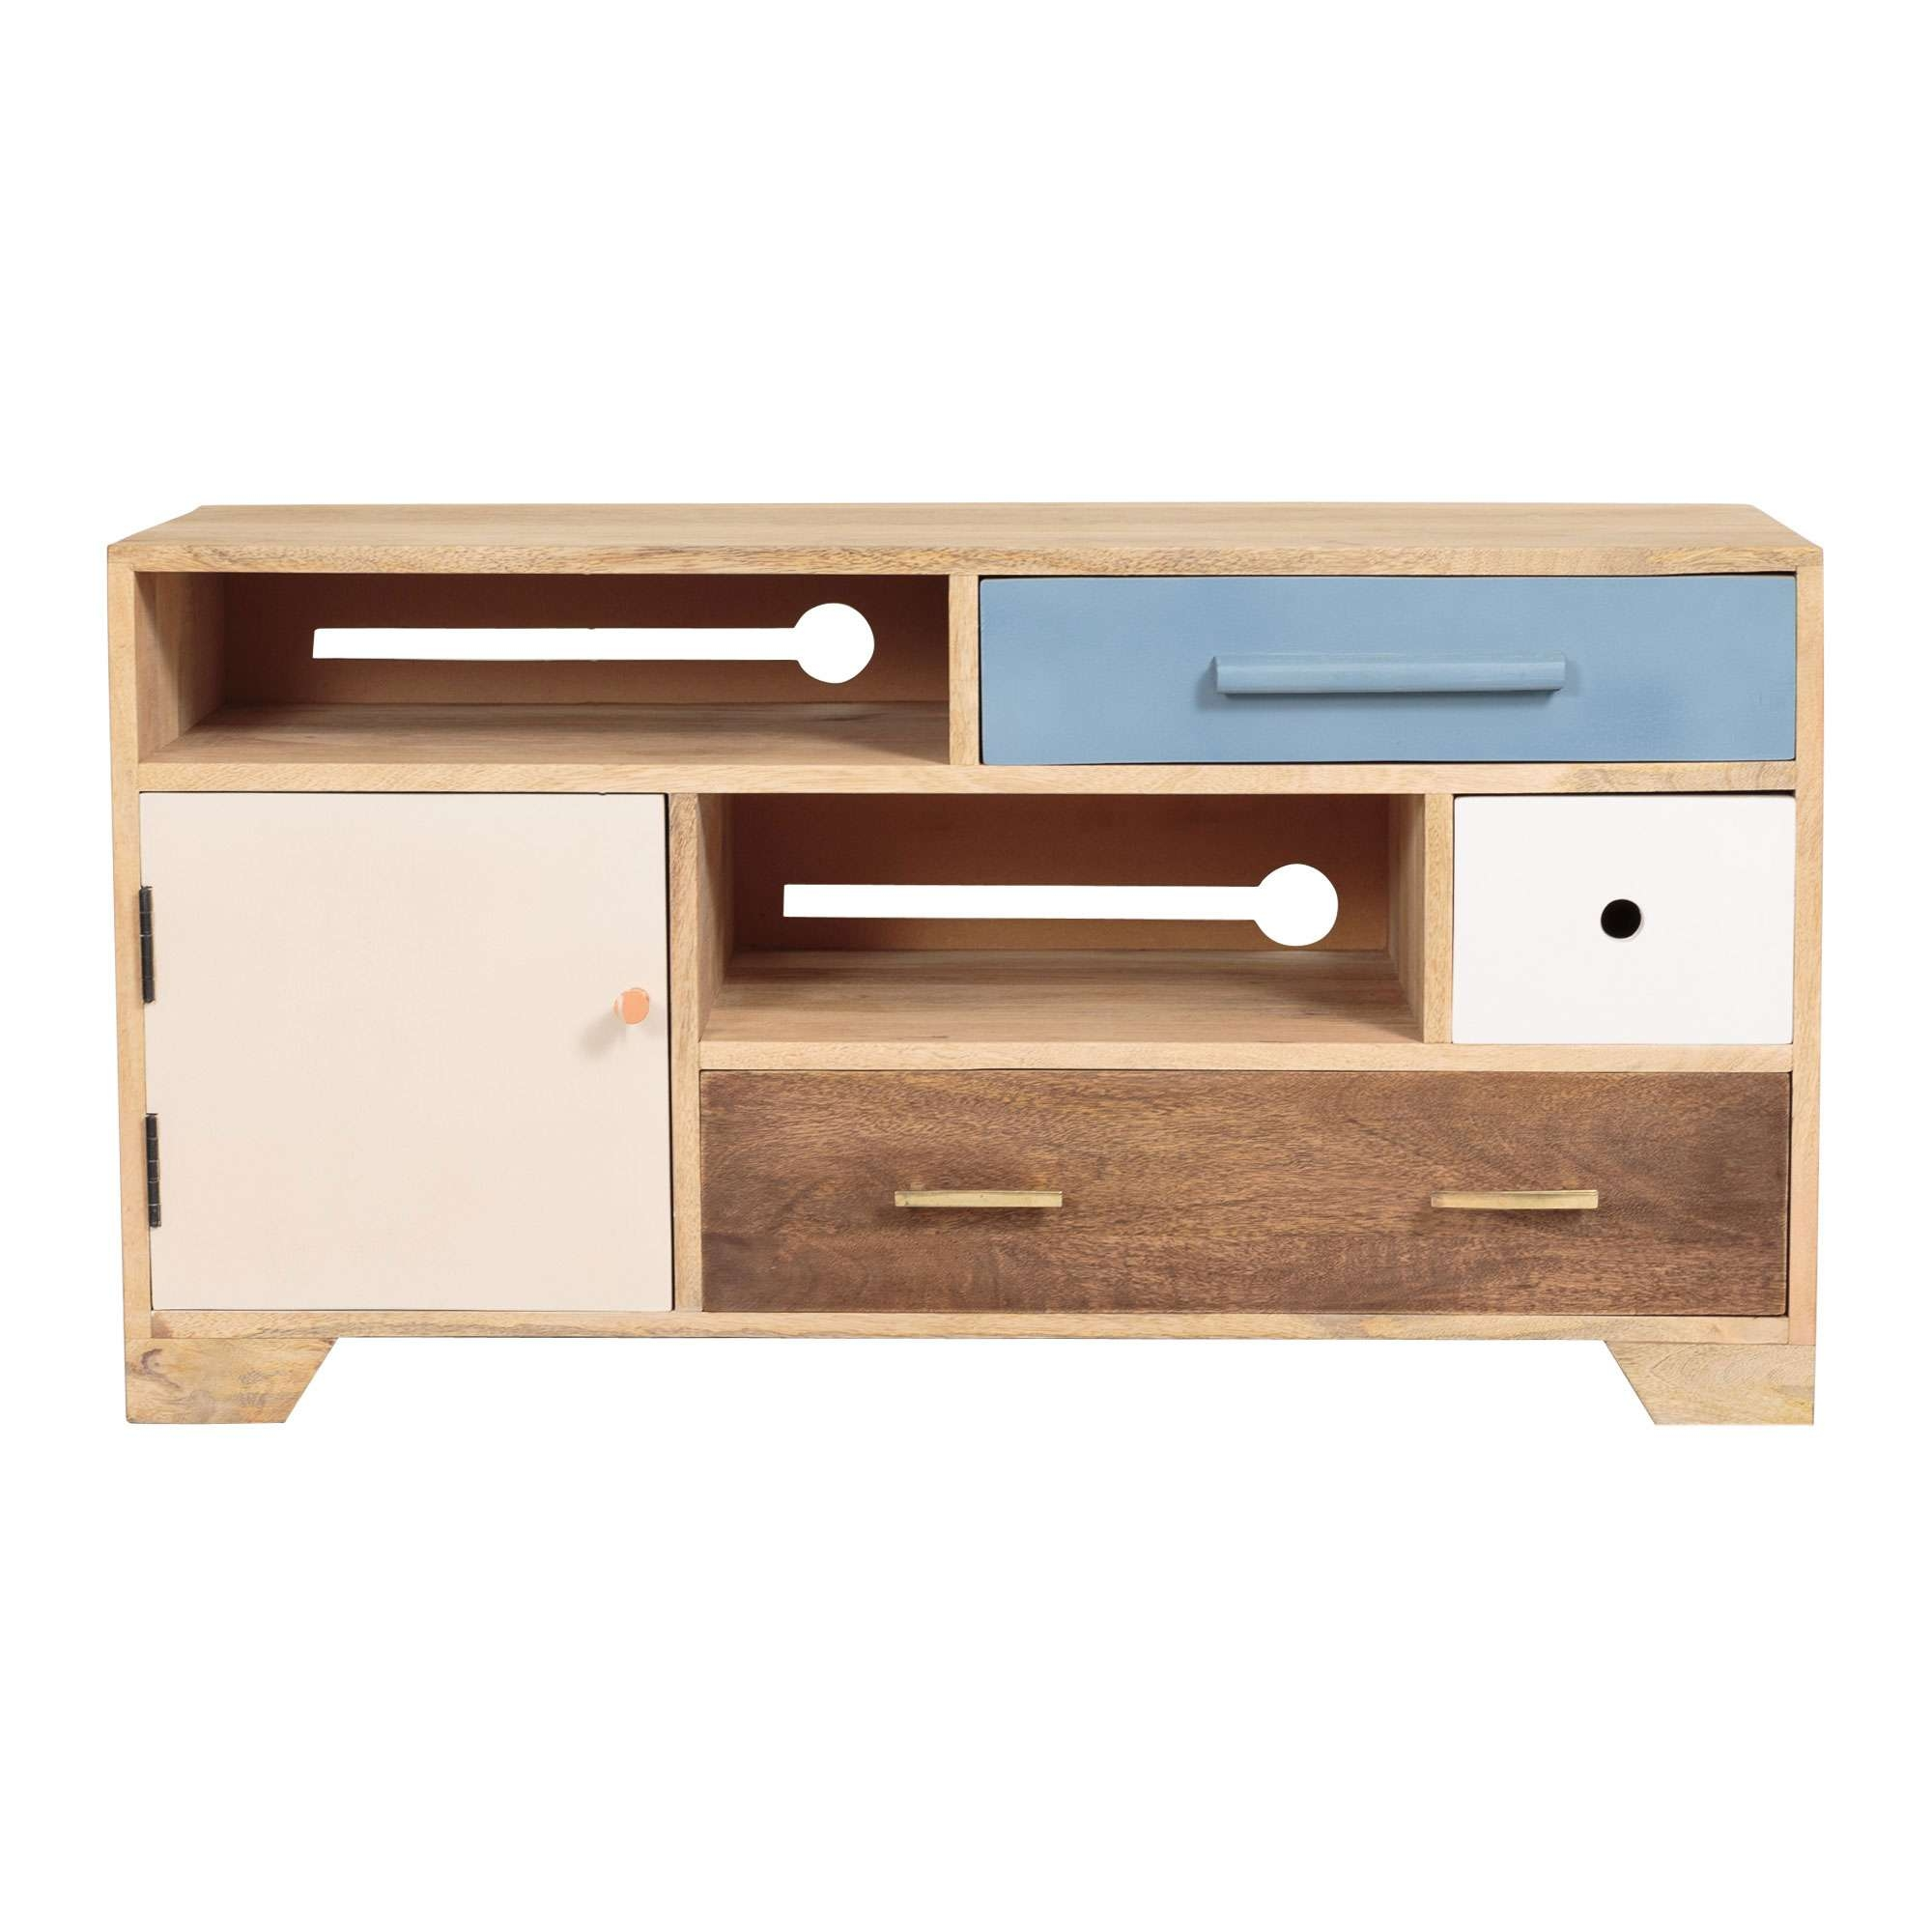 Storage & Shelving | Furniture | Oliver Bonas | Oliver Bonas For Funky Tv Cabinets (View 13 of 20)